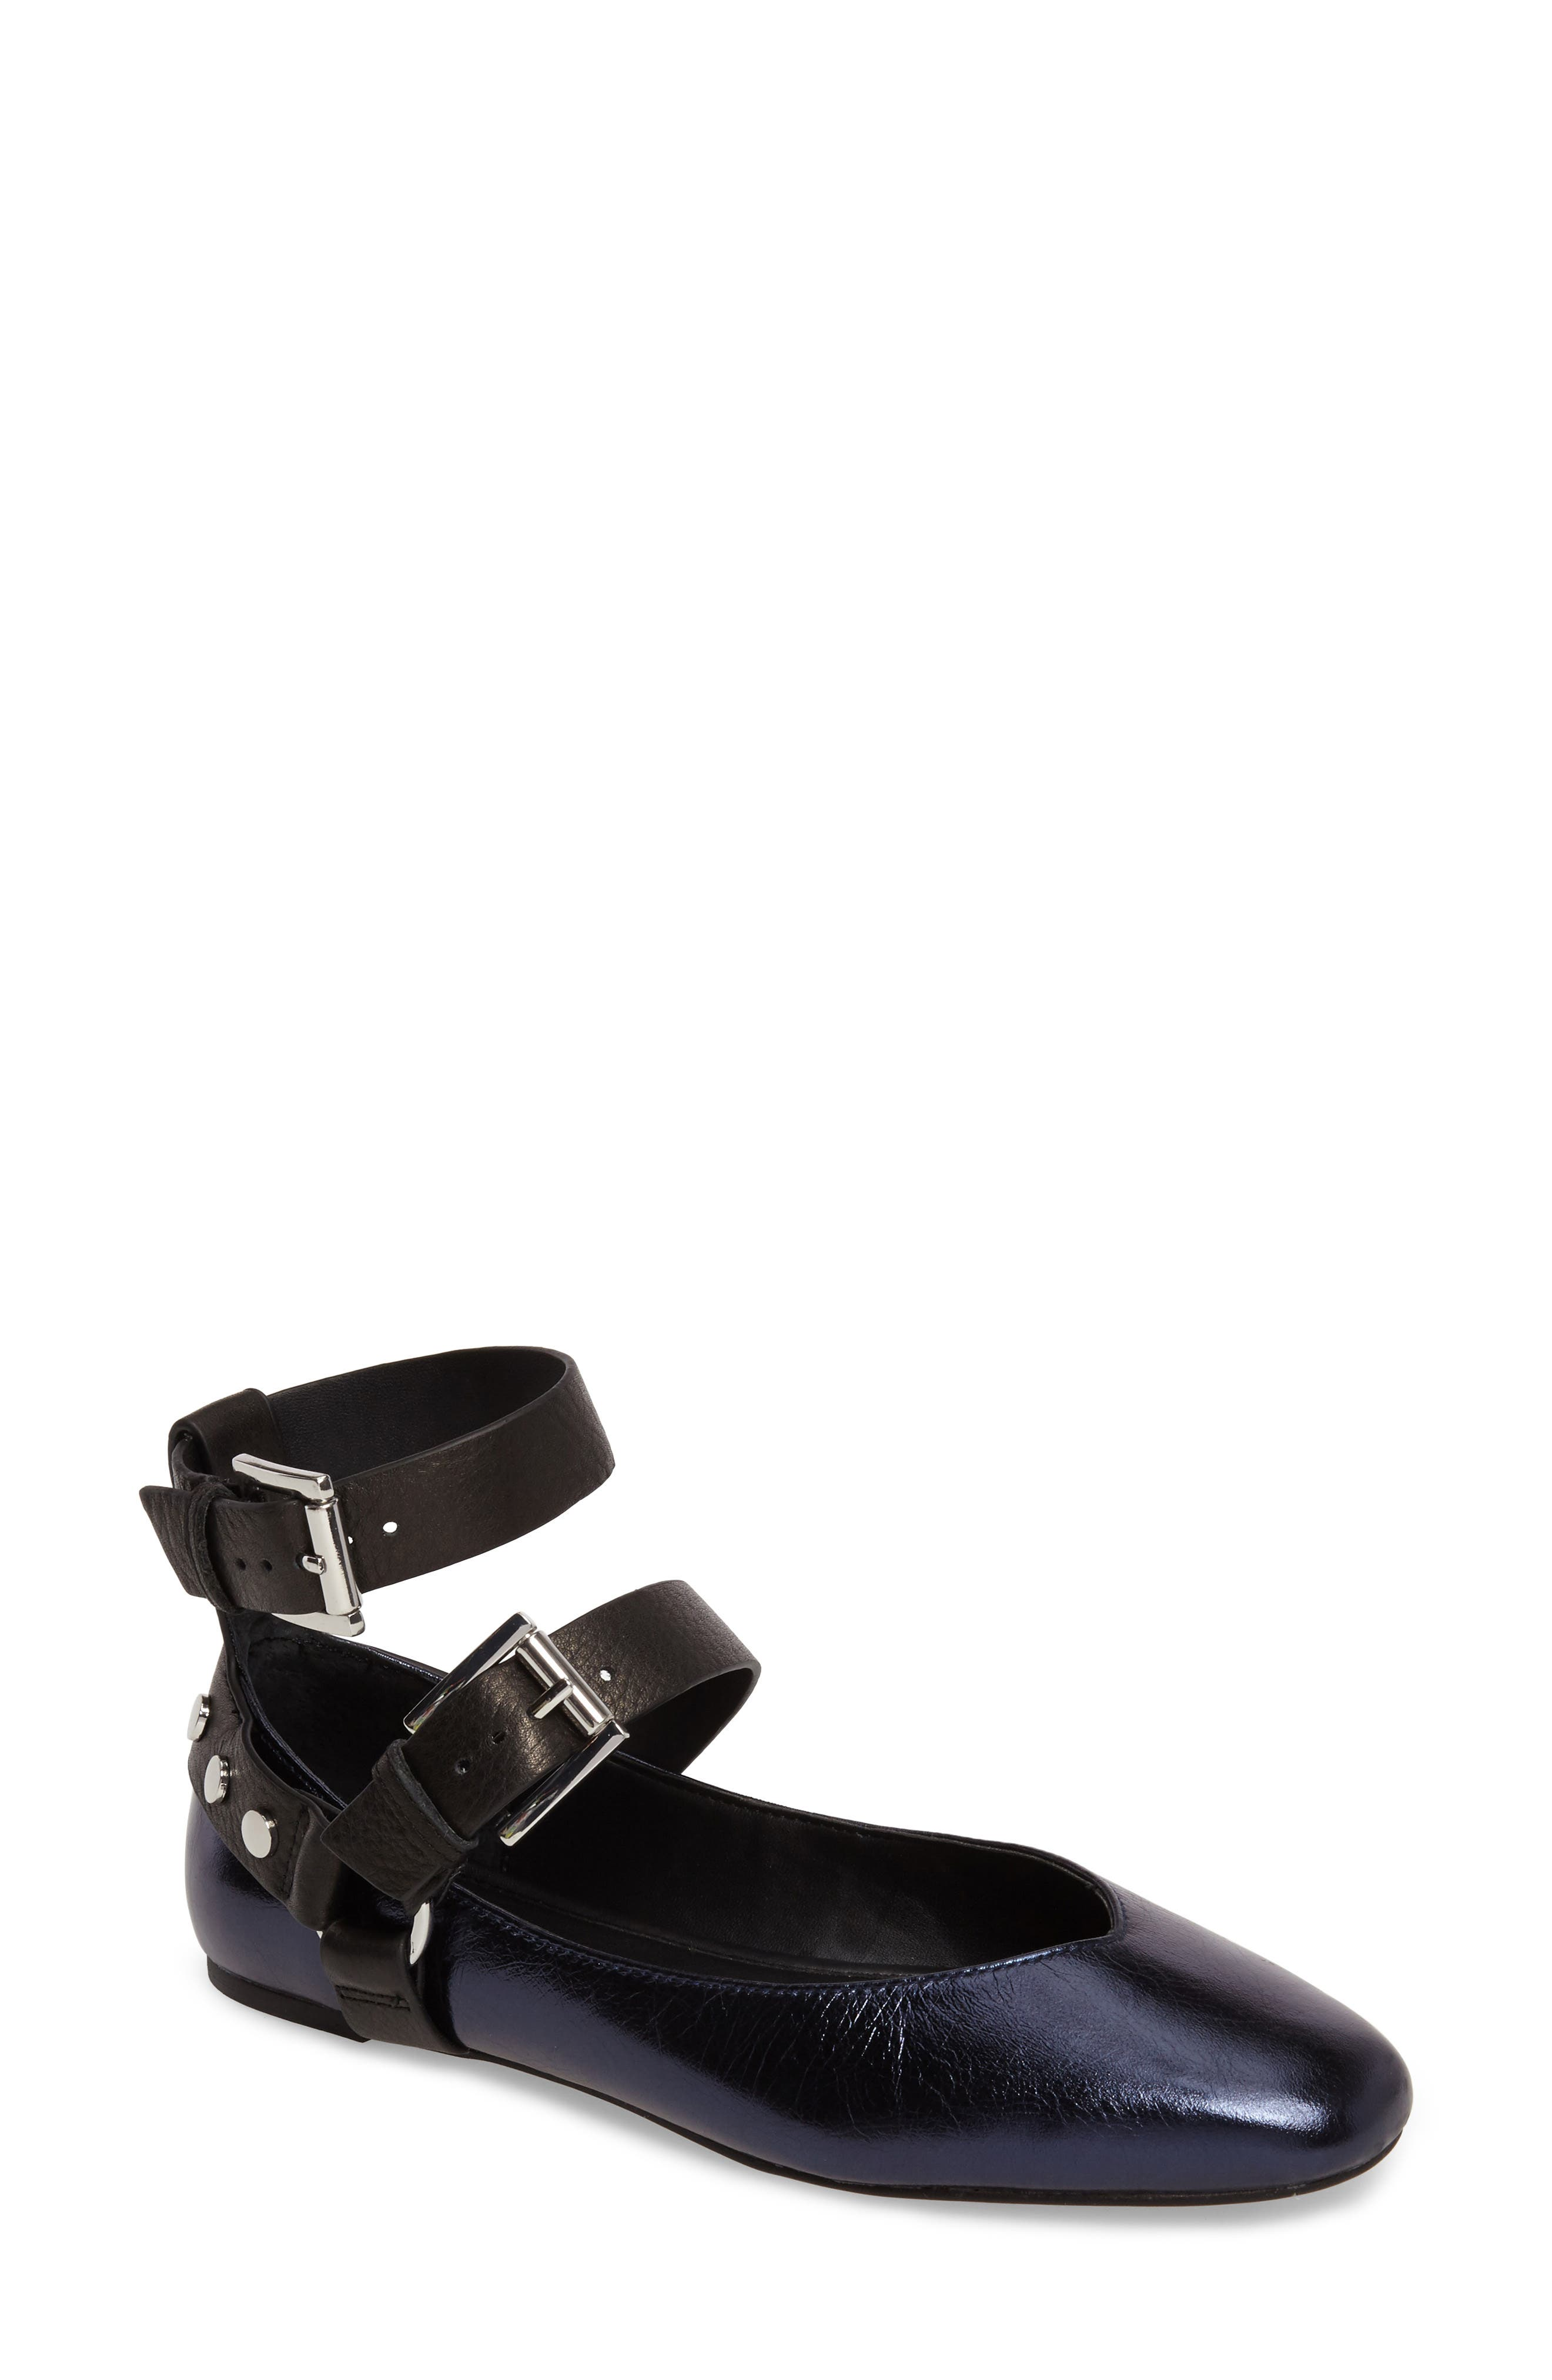 Vivica Ankle Strap Flat,                         Main,                         color, 001